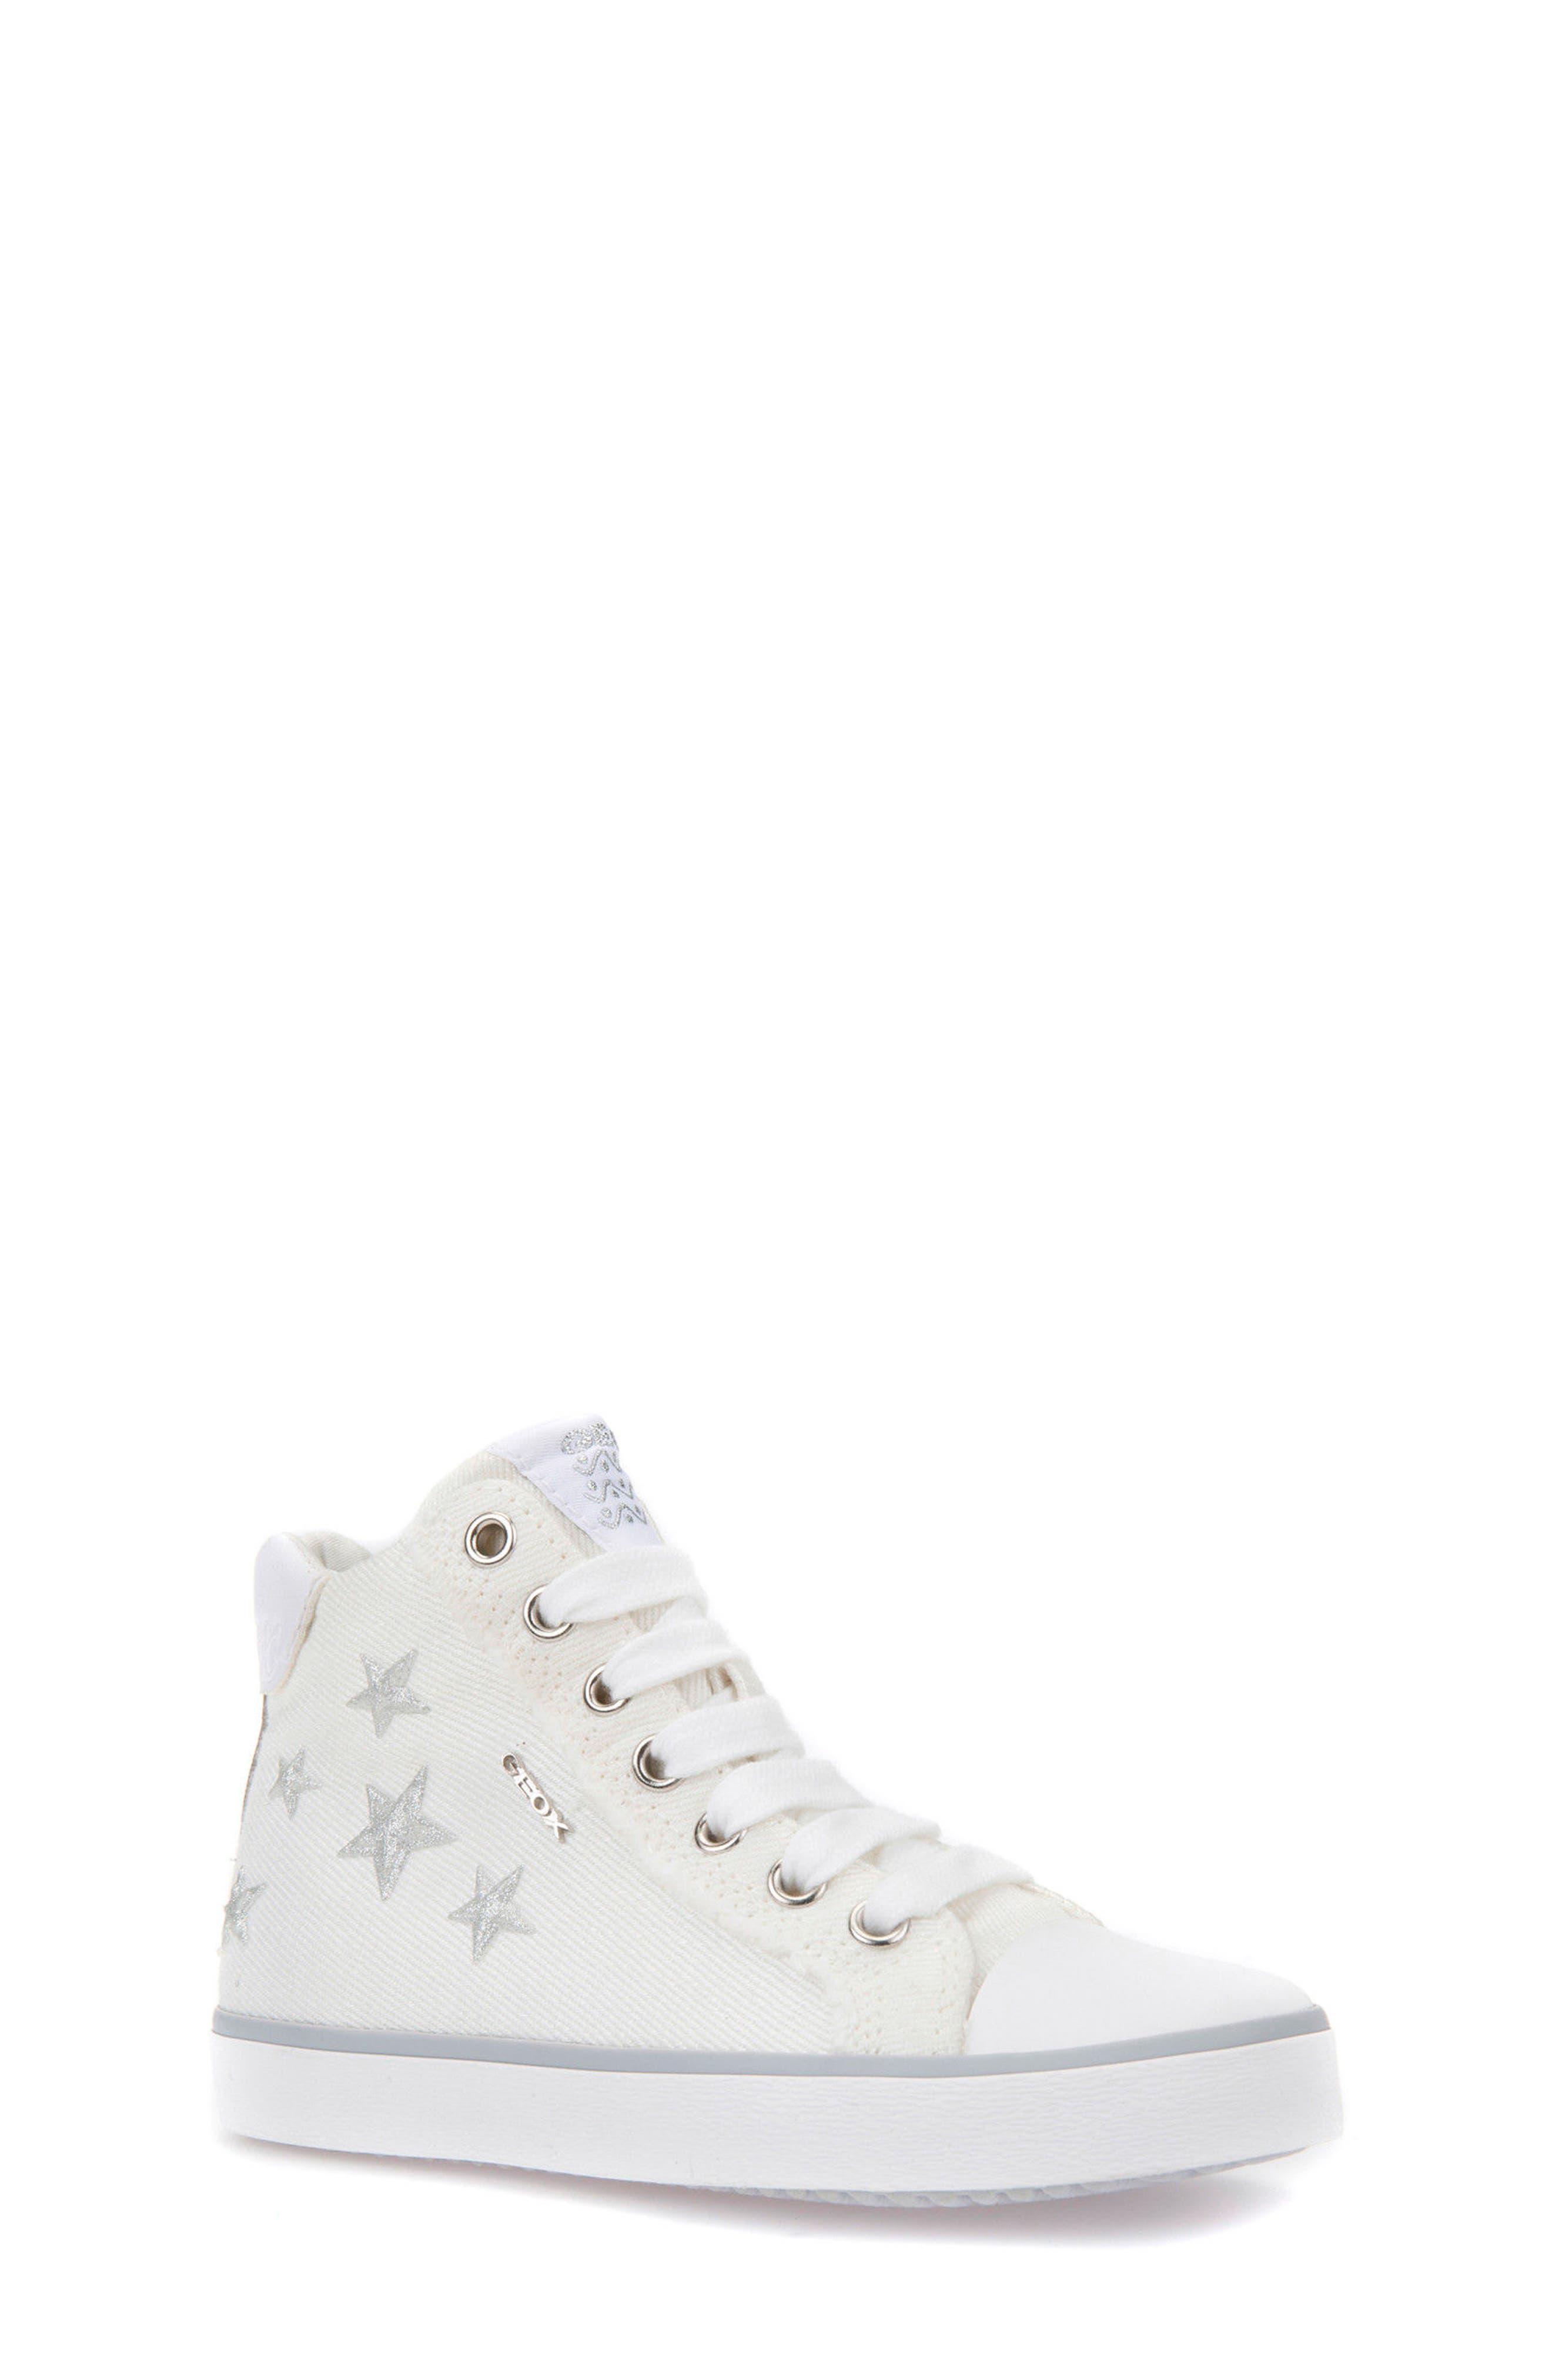 Kilwi High Top Zip Sneaker,                         Main,                         color, WHITE